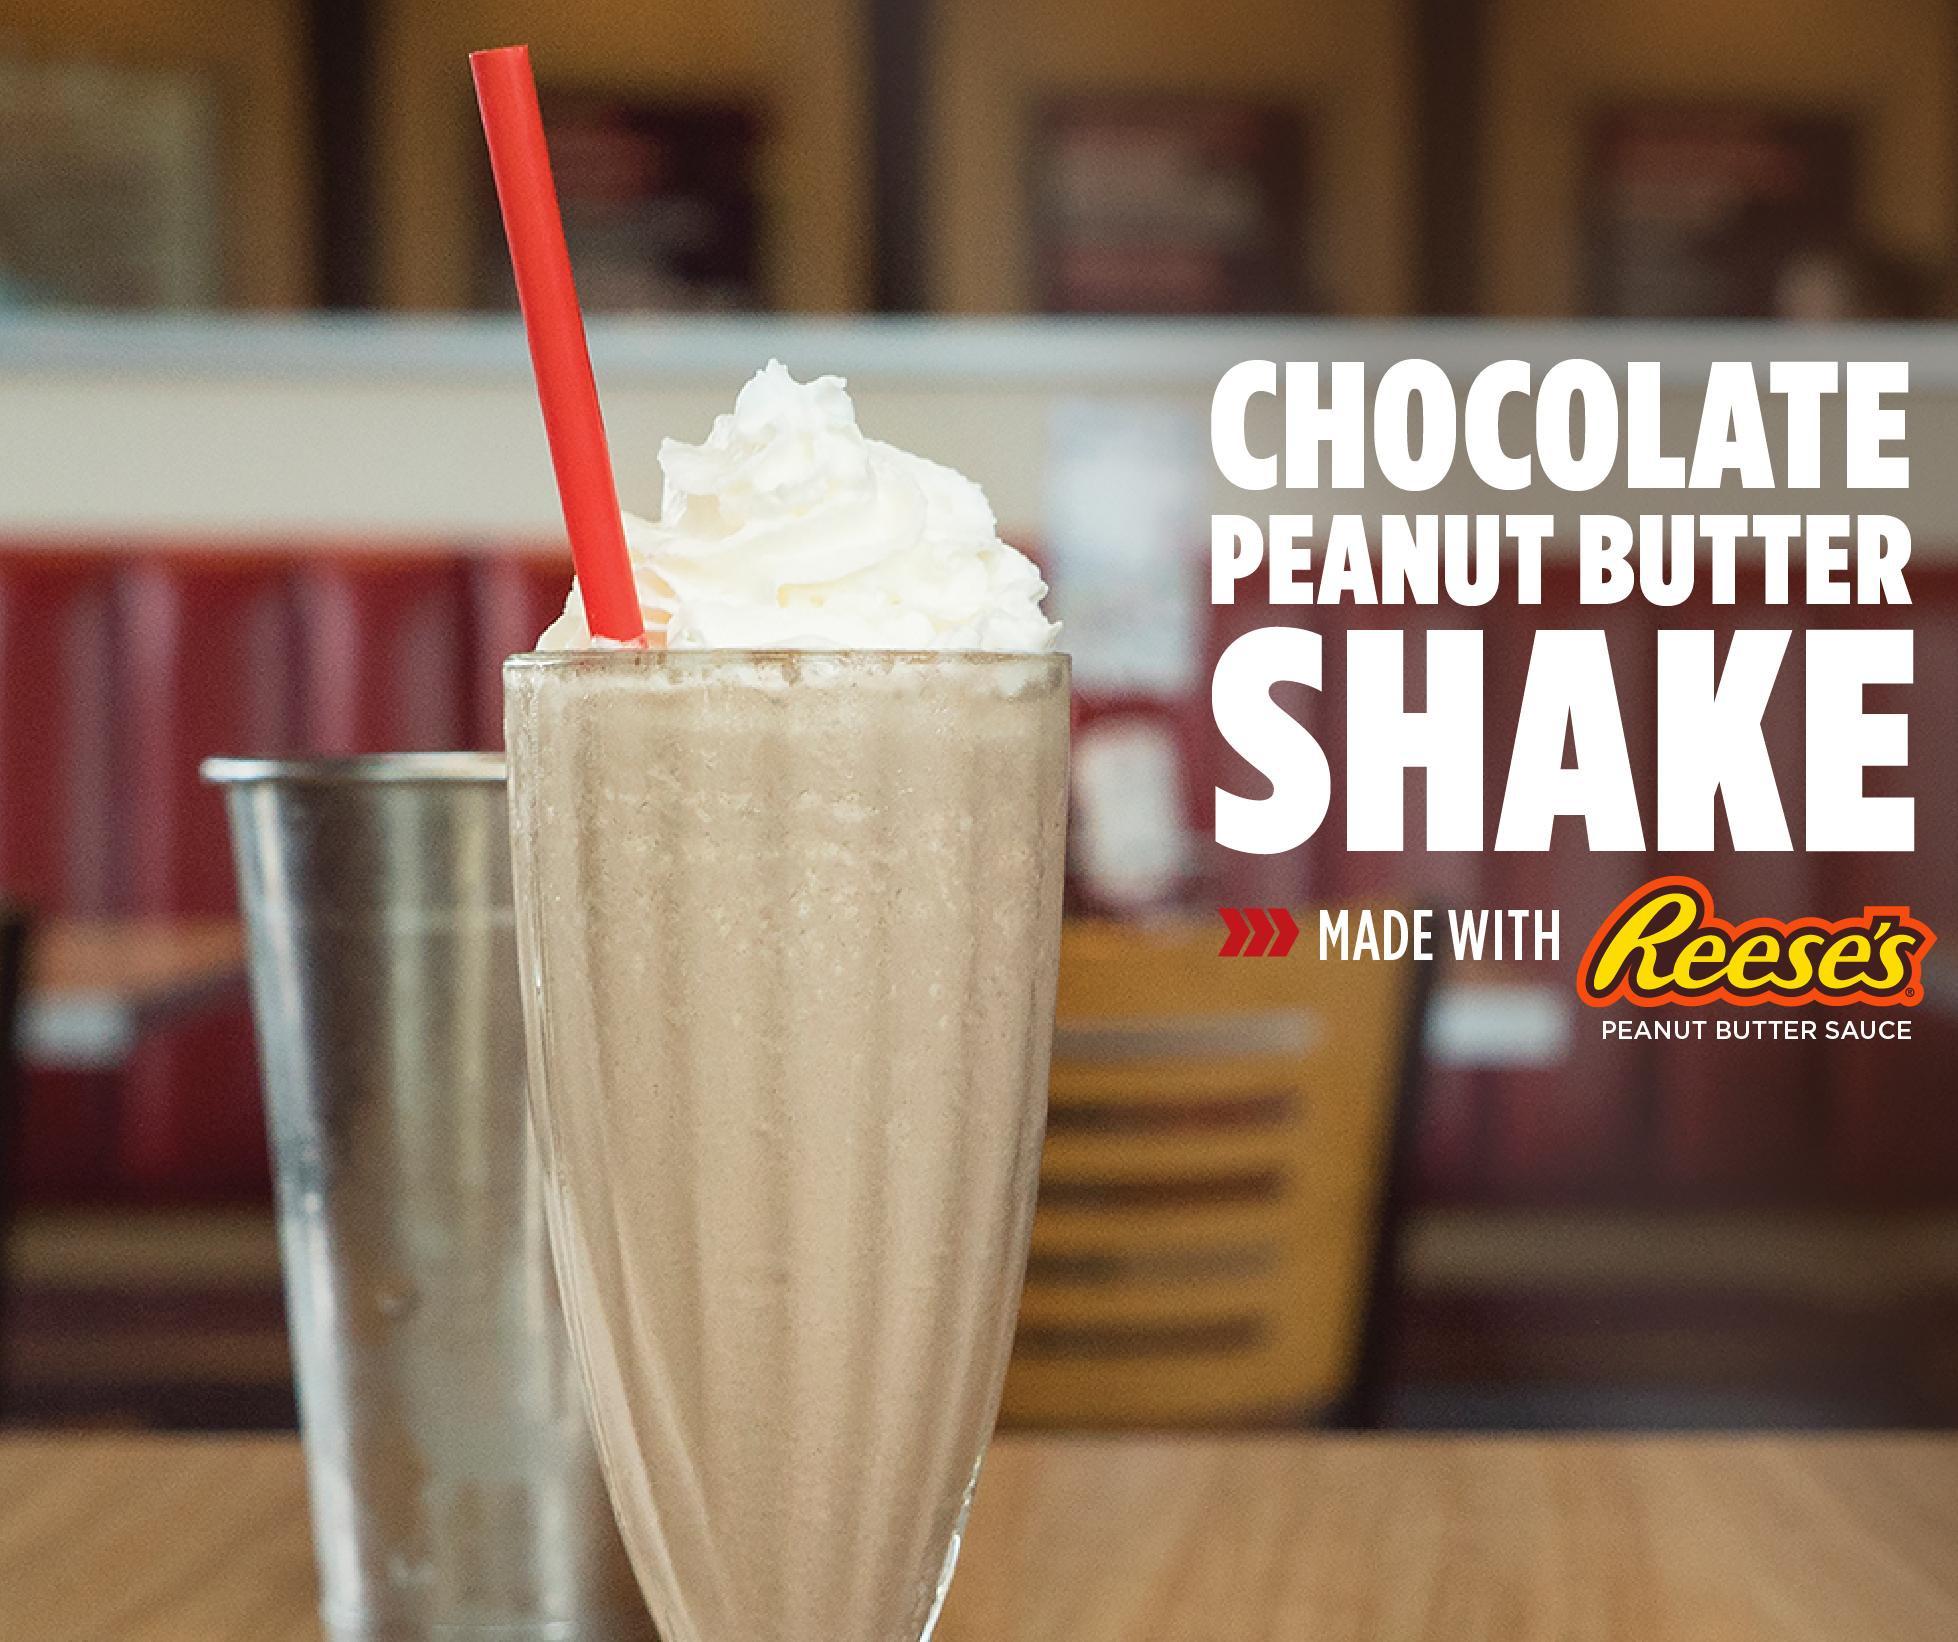 Smashburger's Peanut Butter and Chocolate Shake